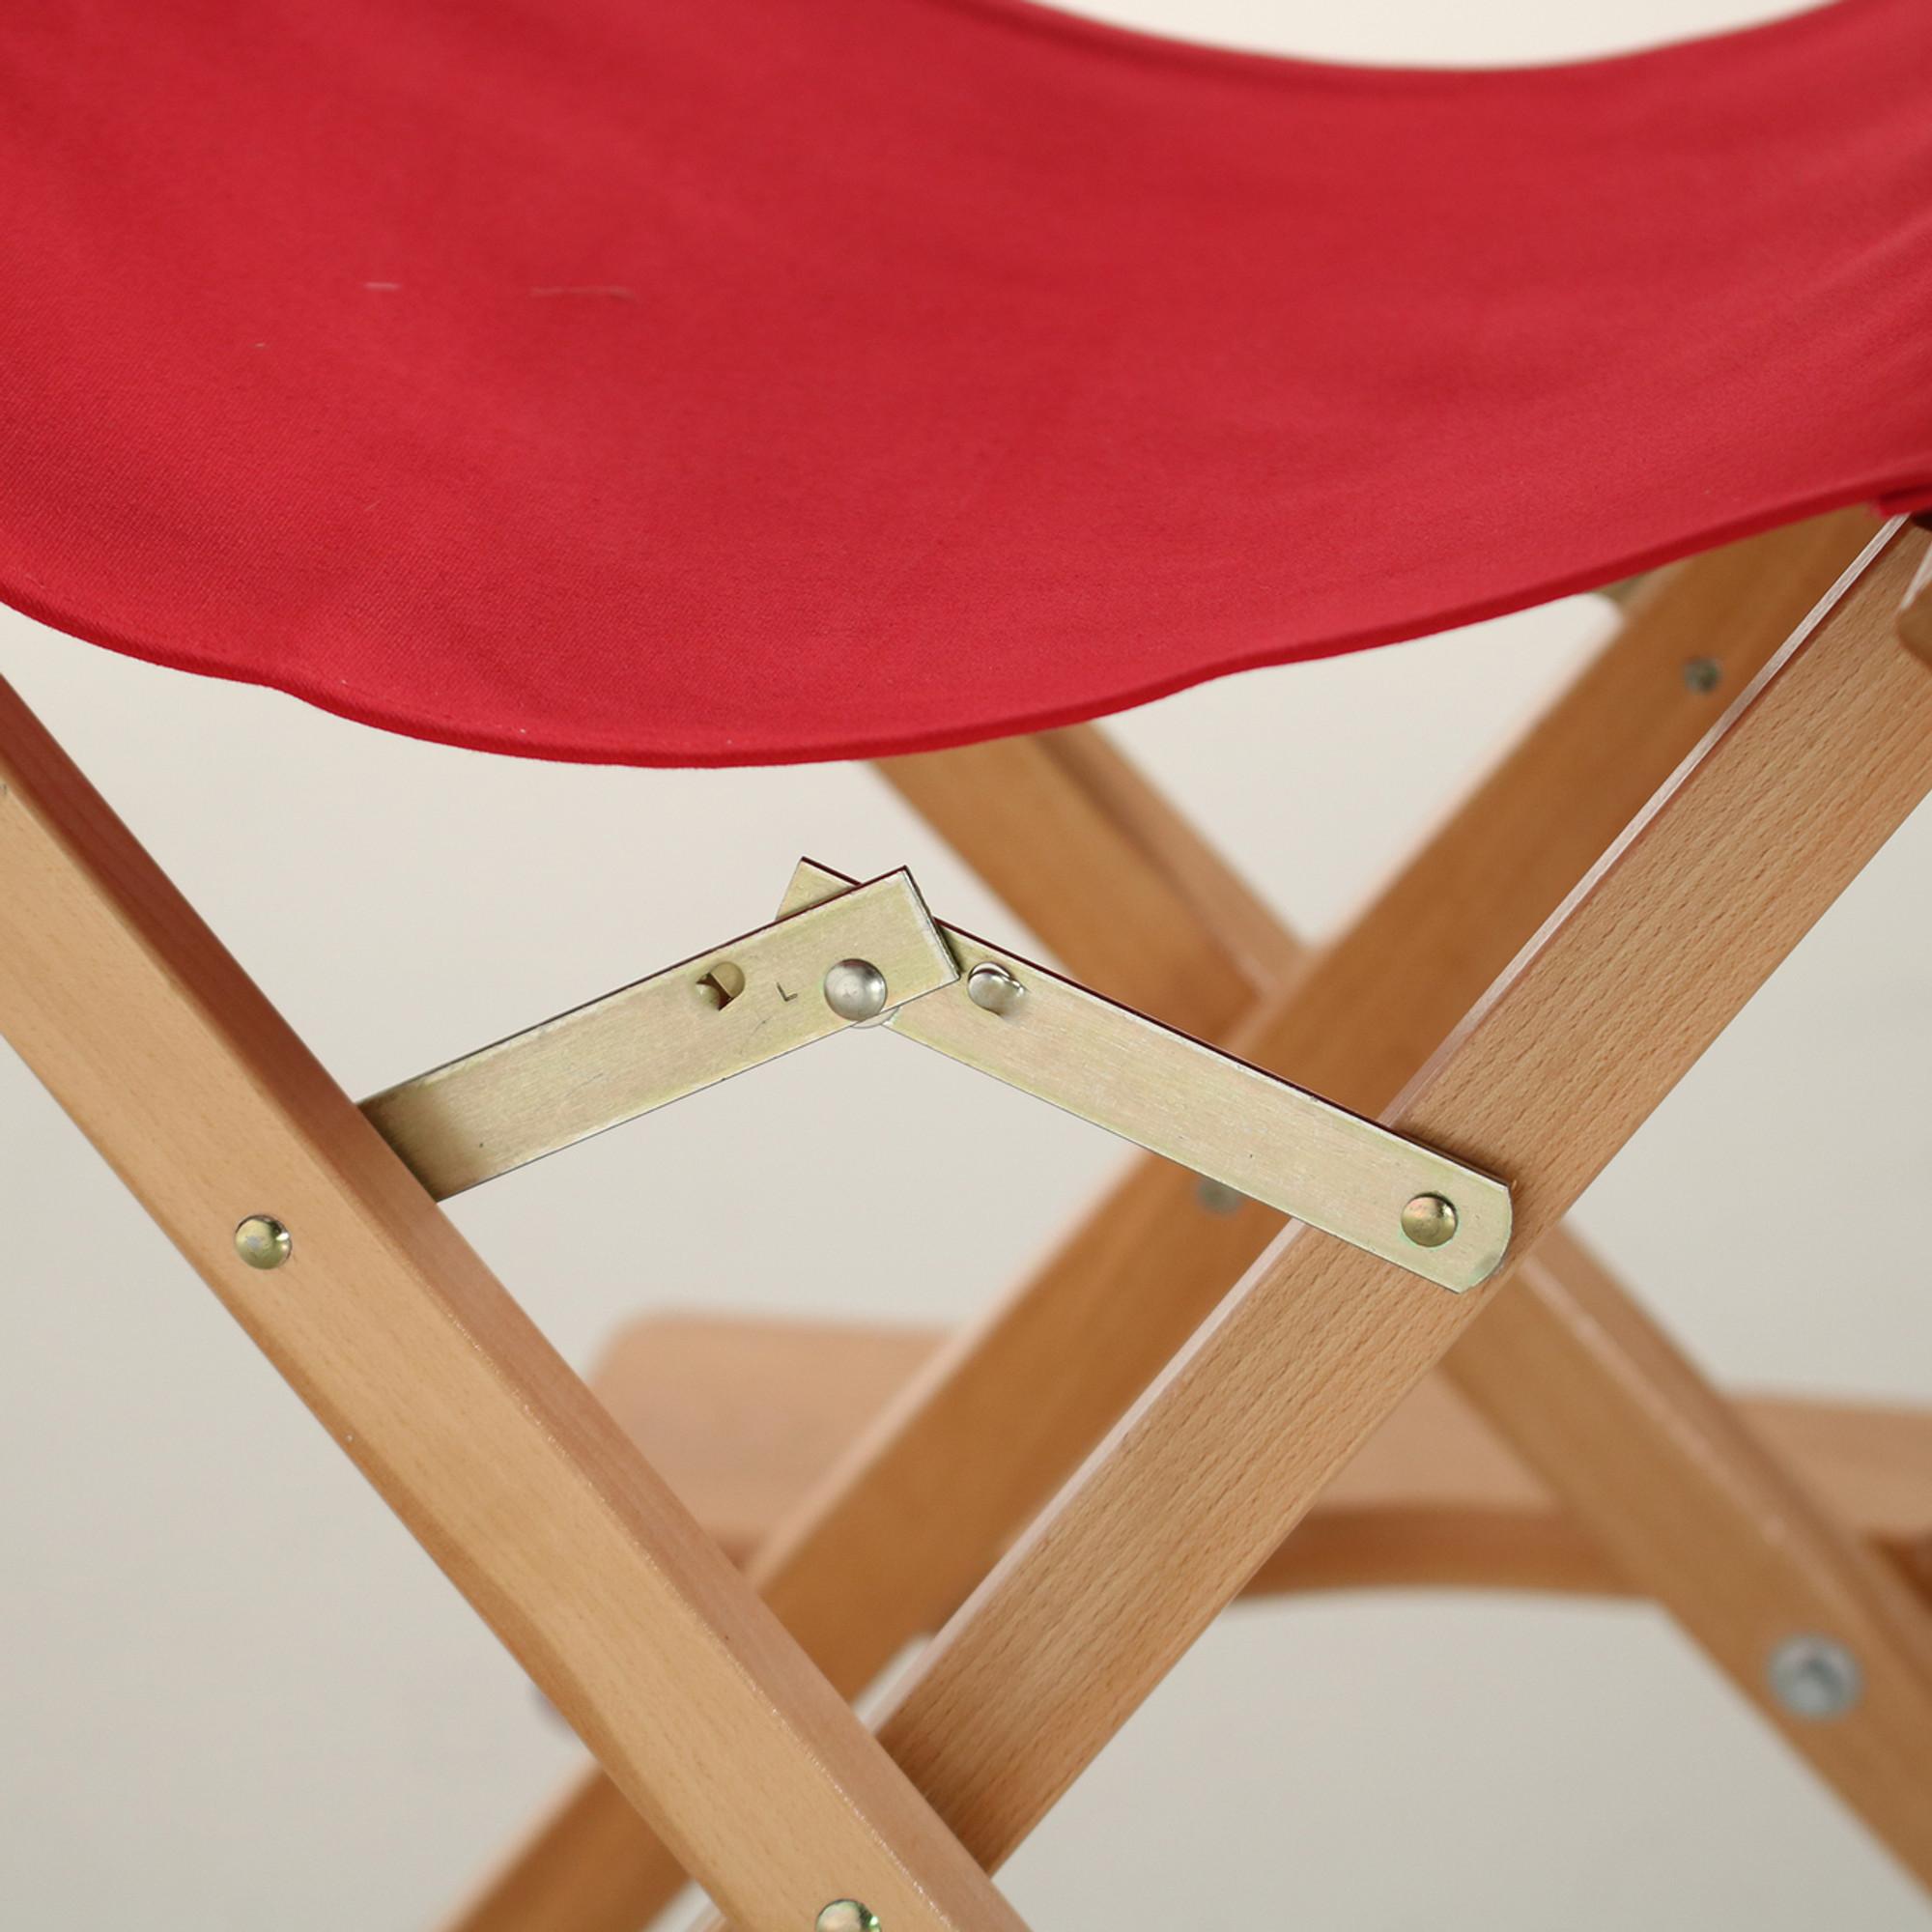 Phenomenal Custom Printed Logo Directors Chair Unemploymentrelief Wooden Chair Designs For Living Room Unemploymentrelieforg